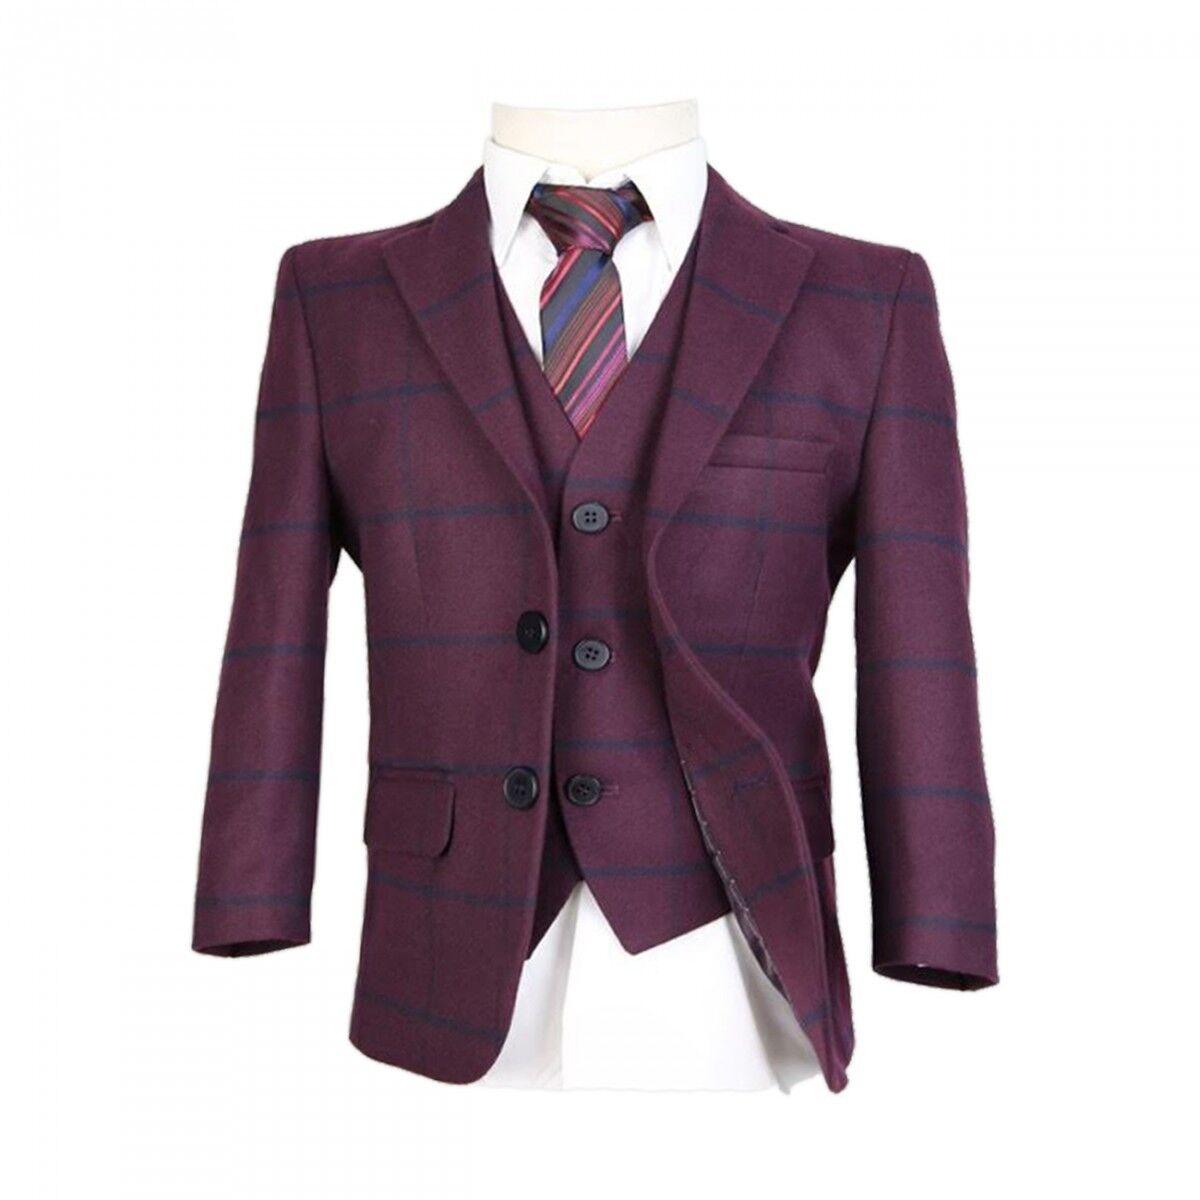 Boys Wool Mix Checkered Suits Boy Pageboy Wedding Prom